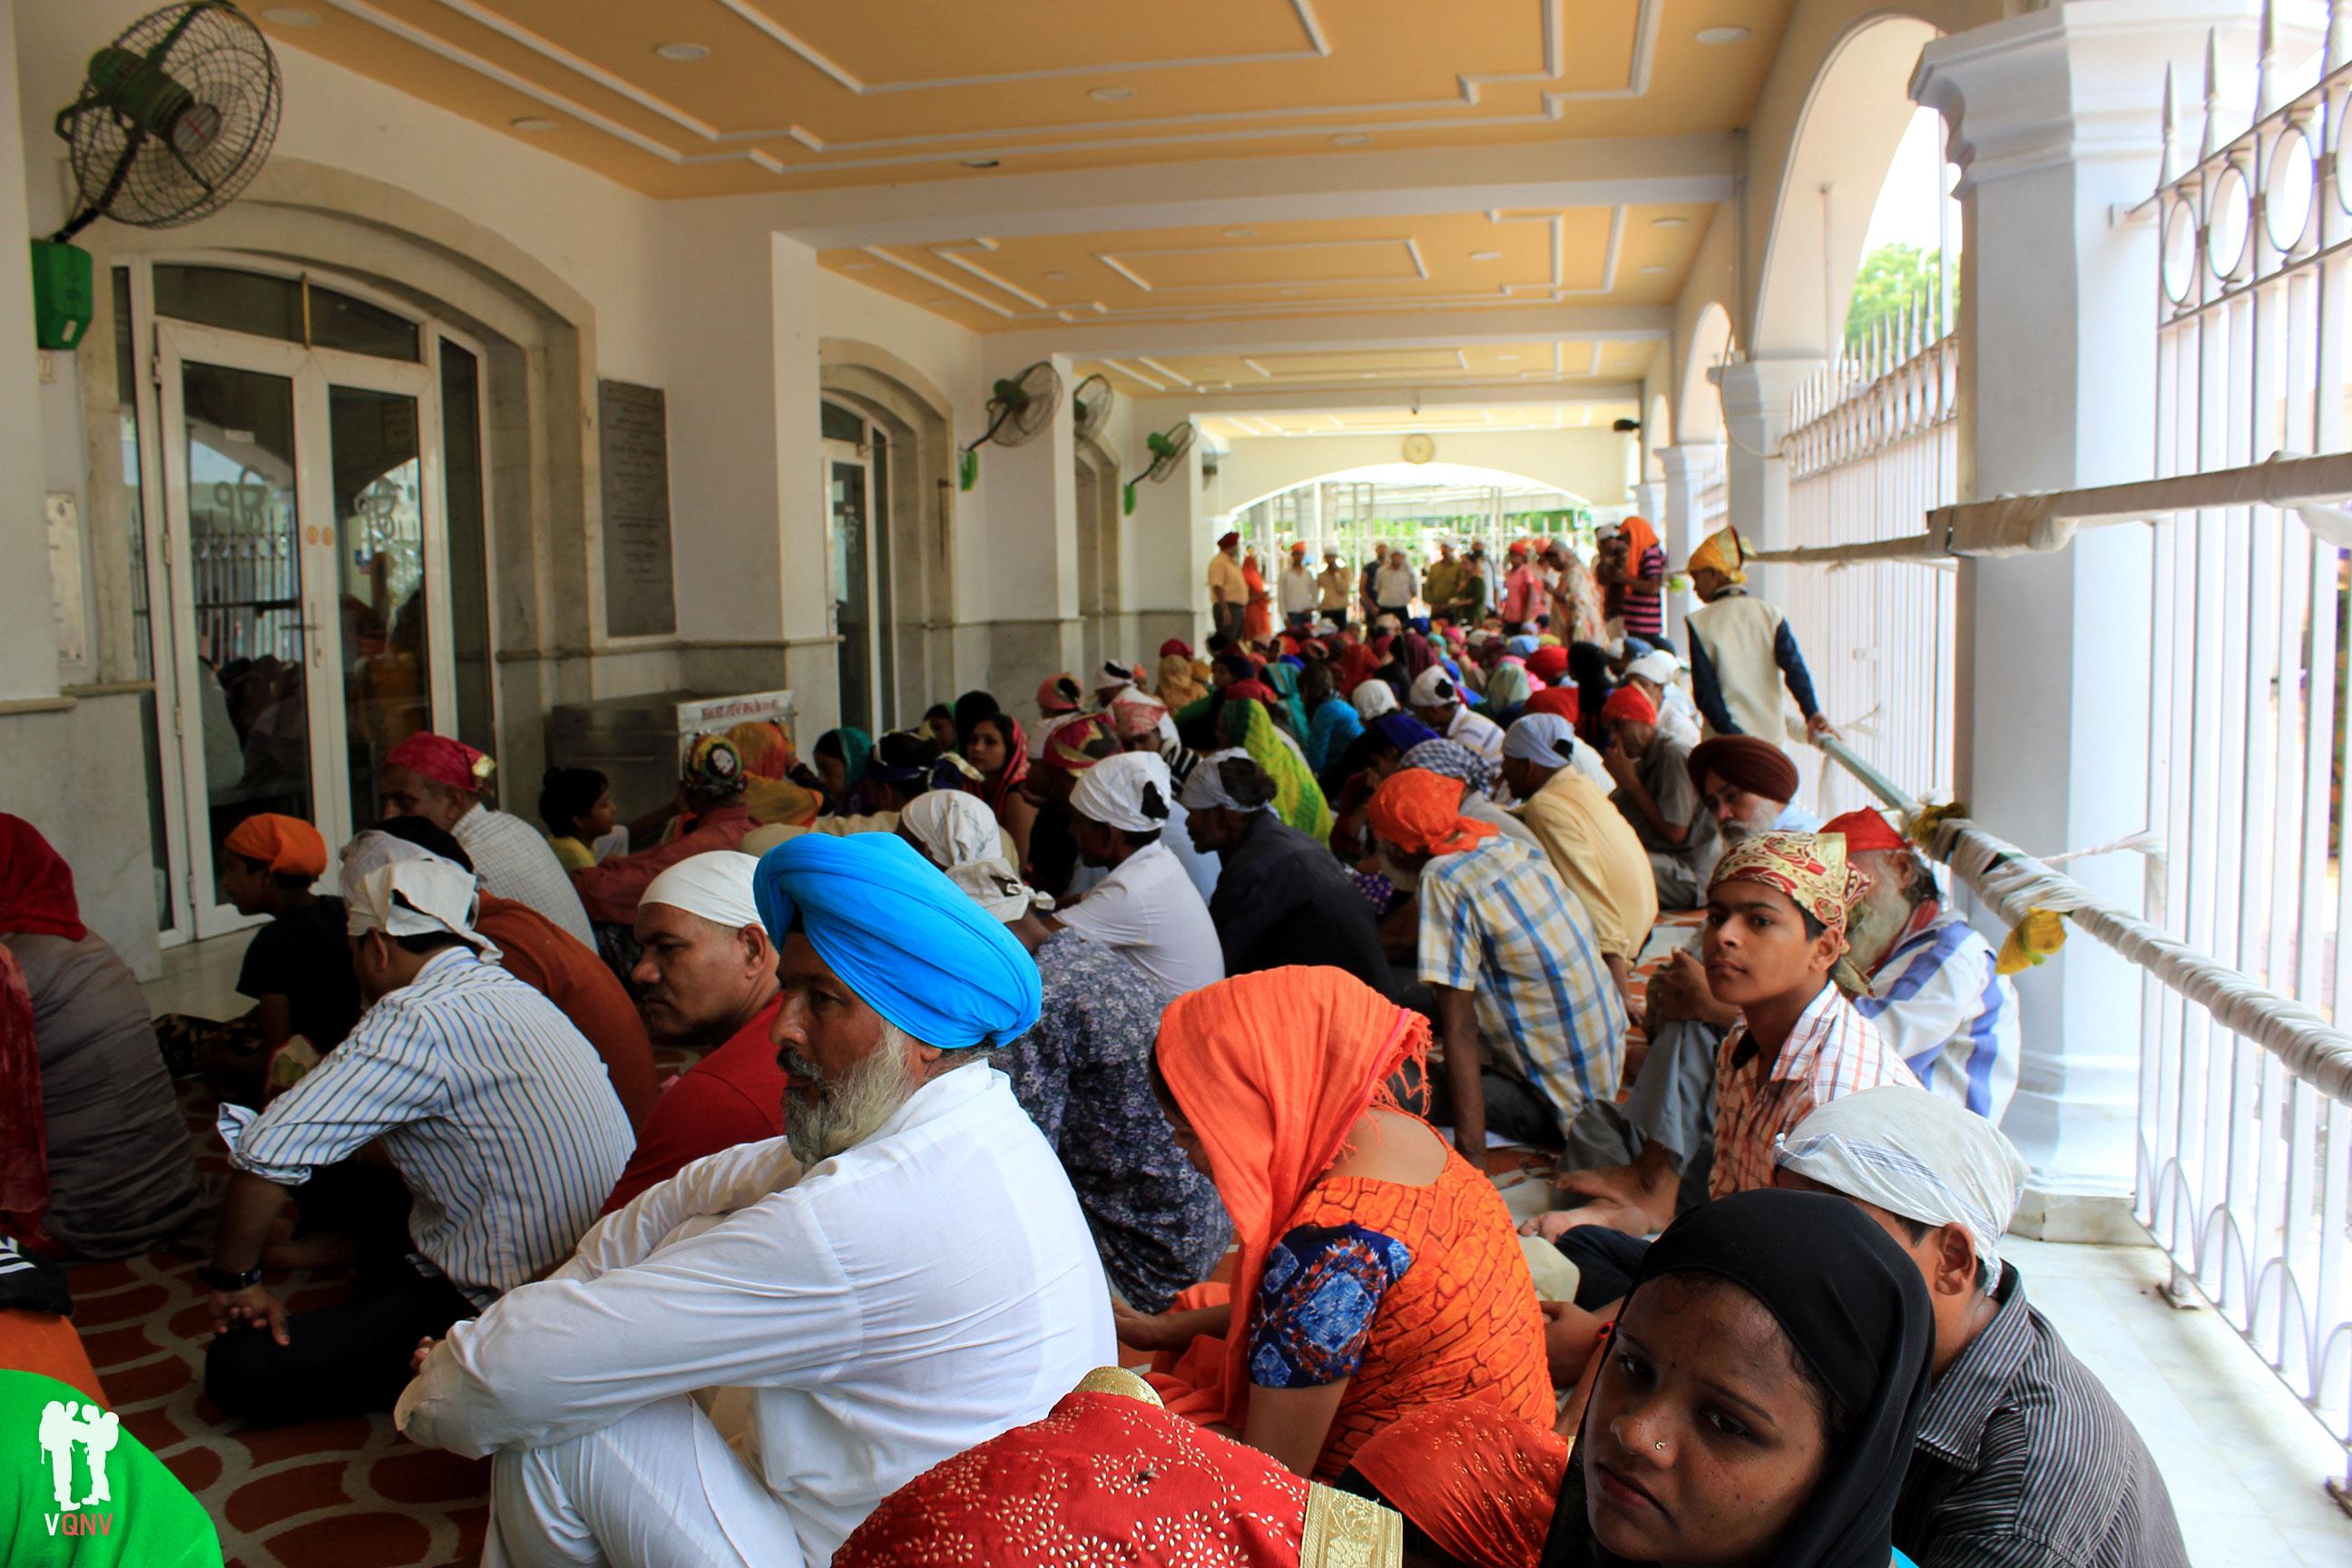 Espera del almuerzo en el Templo Sikh Gurdwara Bangla Sahib